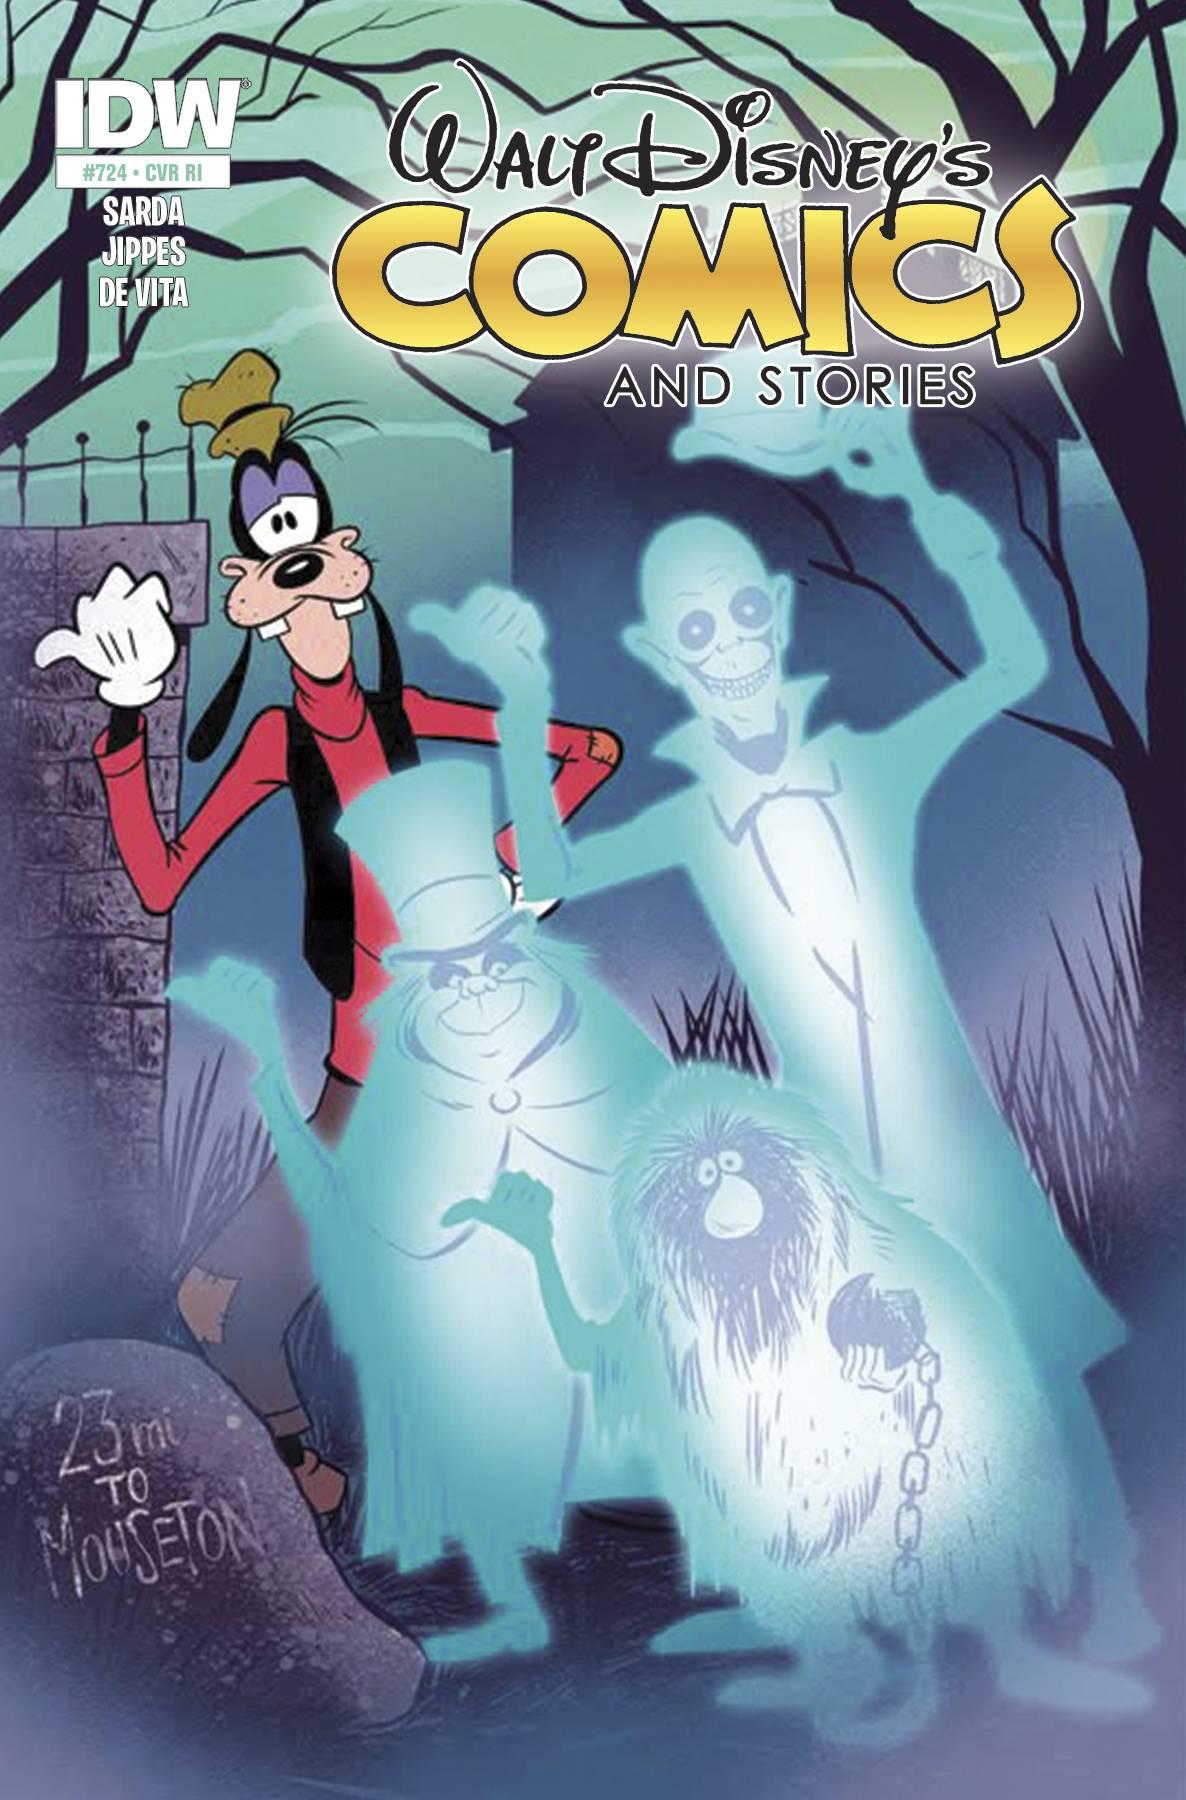 Walt Disney Comics & Stories #724 Review